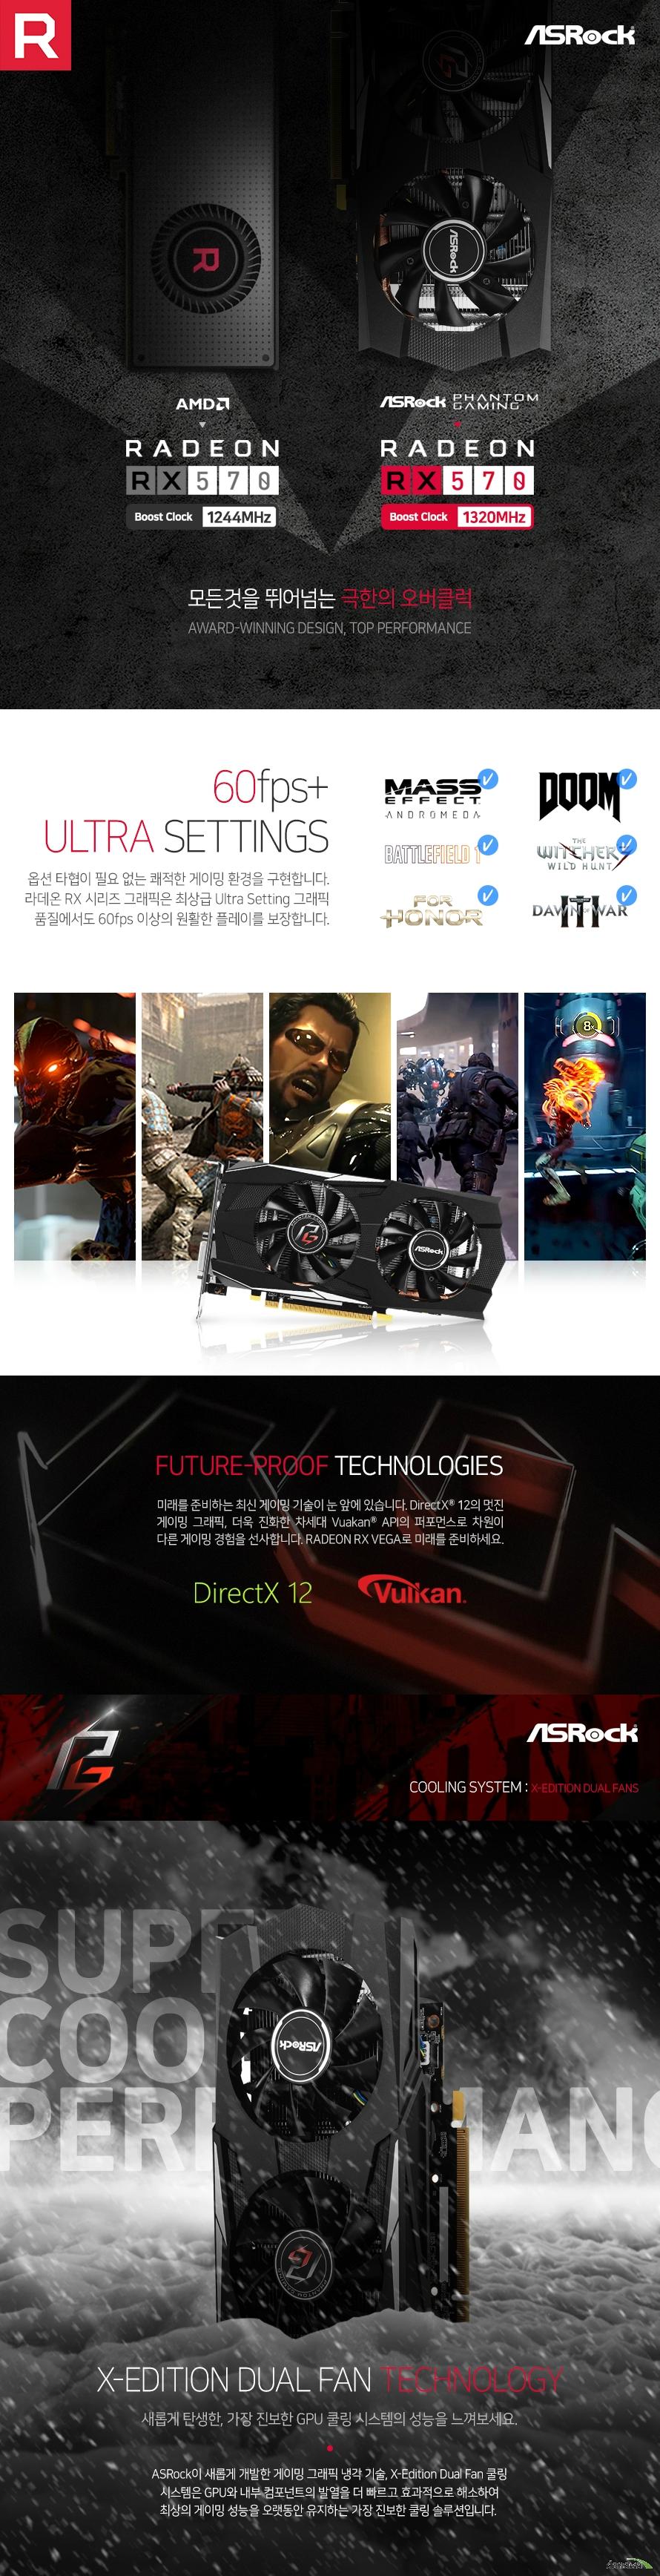 ASRock Phantom Gaming D 라데온 RX 570 OC D5 8GB 에즈윈